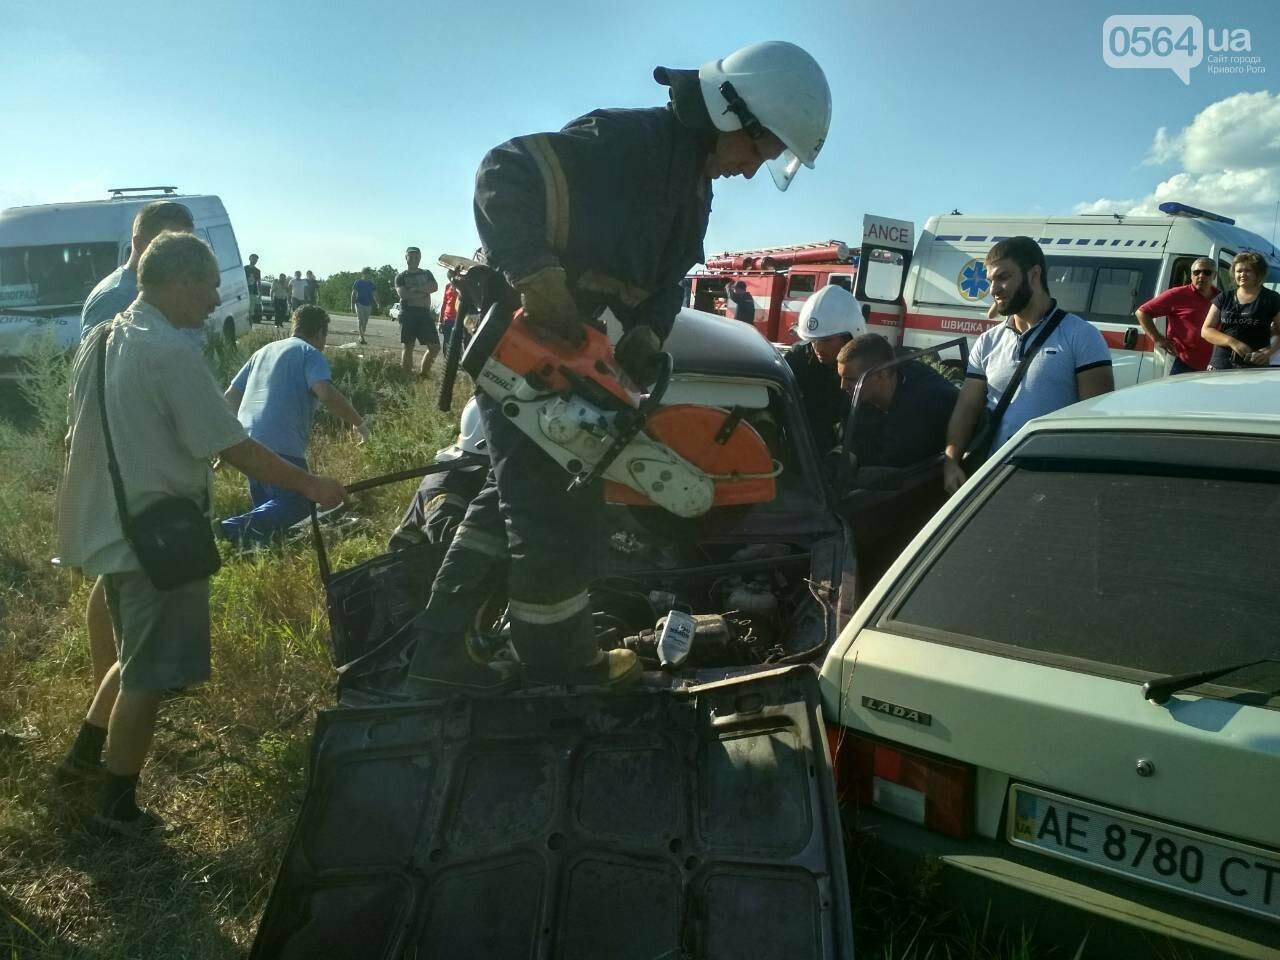 На Днепропетровщине столкнулись маршрутка и 2 легковушки. Один человек погиб, - ФОТО, фото-1